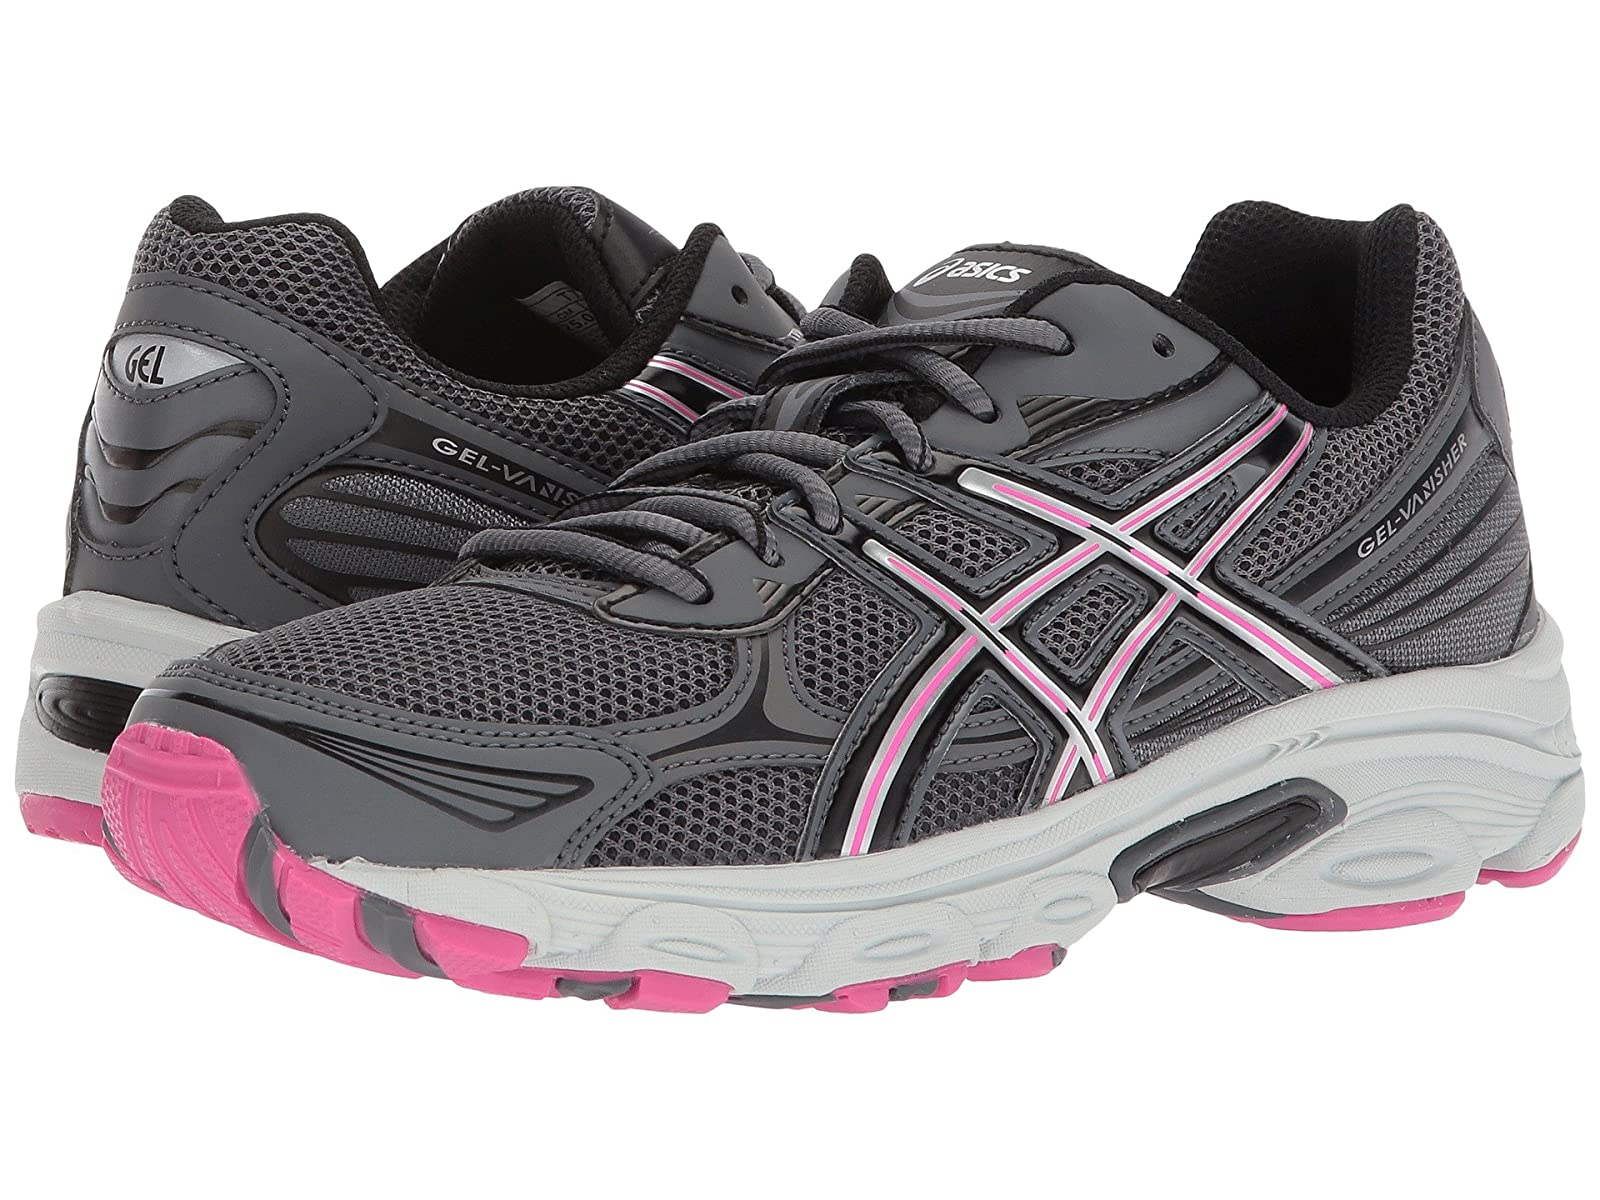 ASICS GEL-VanisherCheap and distinctive eye-catching shoes